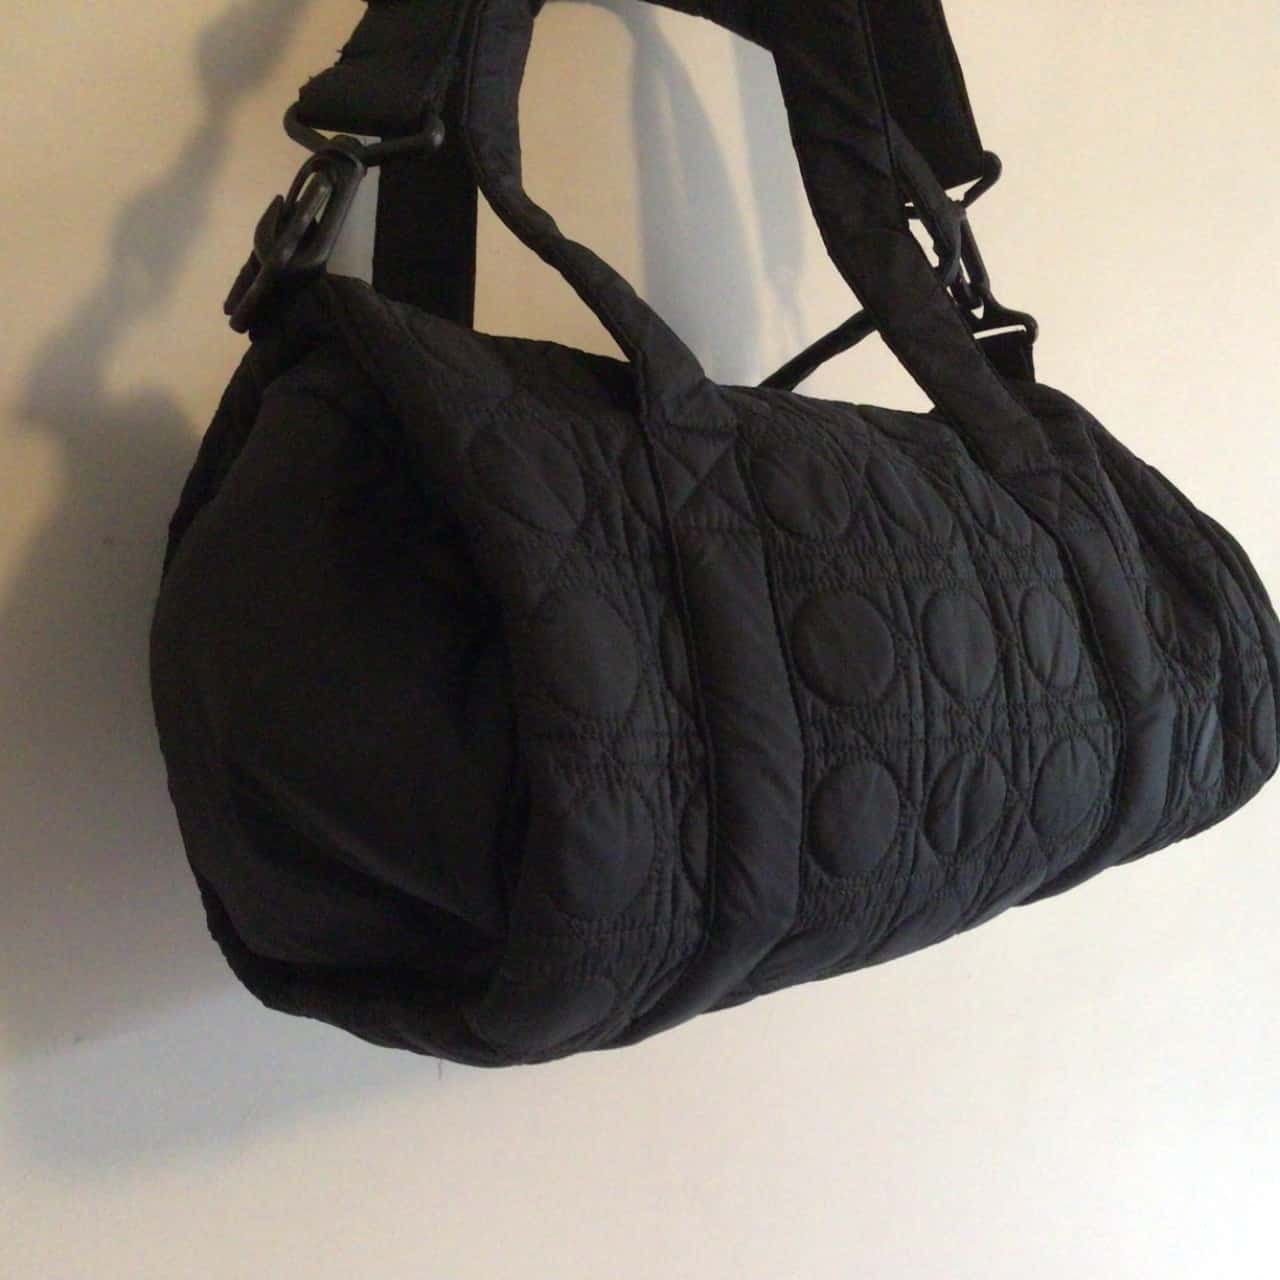 Lorna Jane Womens Black  Barrel Sports Bag 35 cm w 23 cm diameter